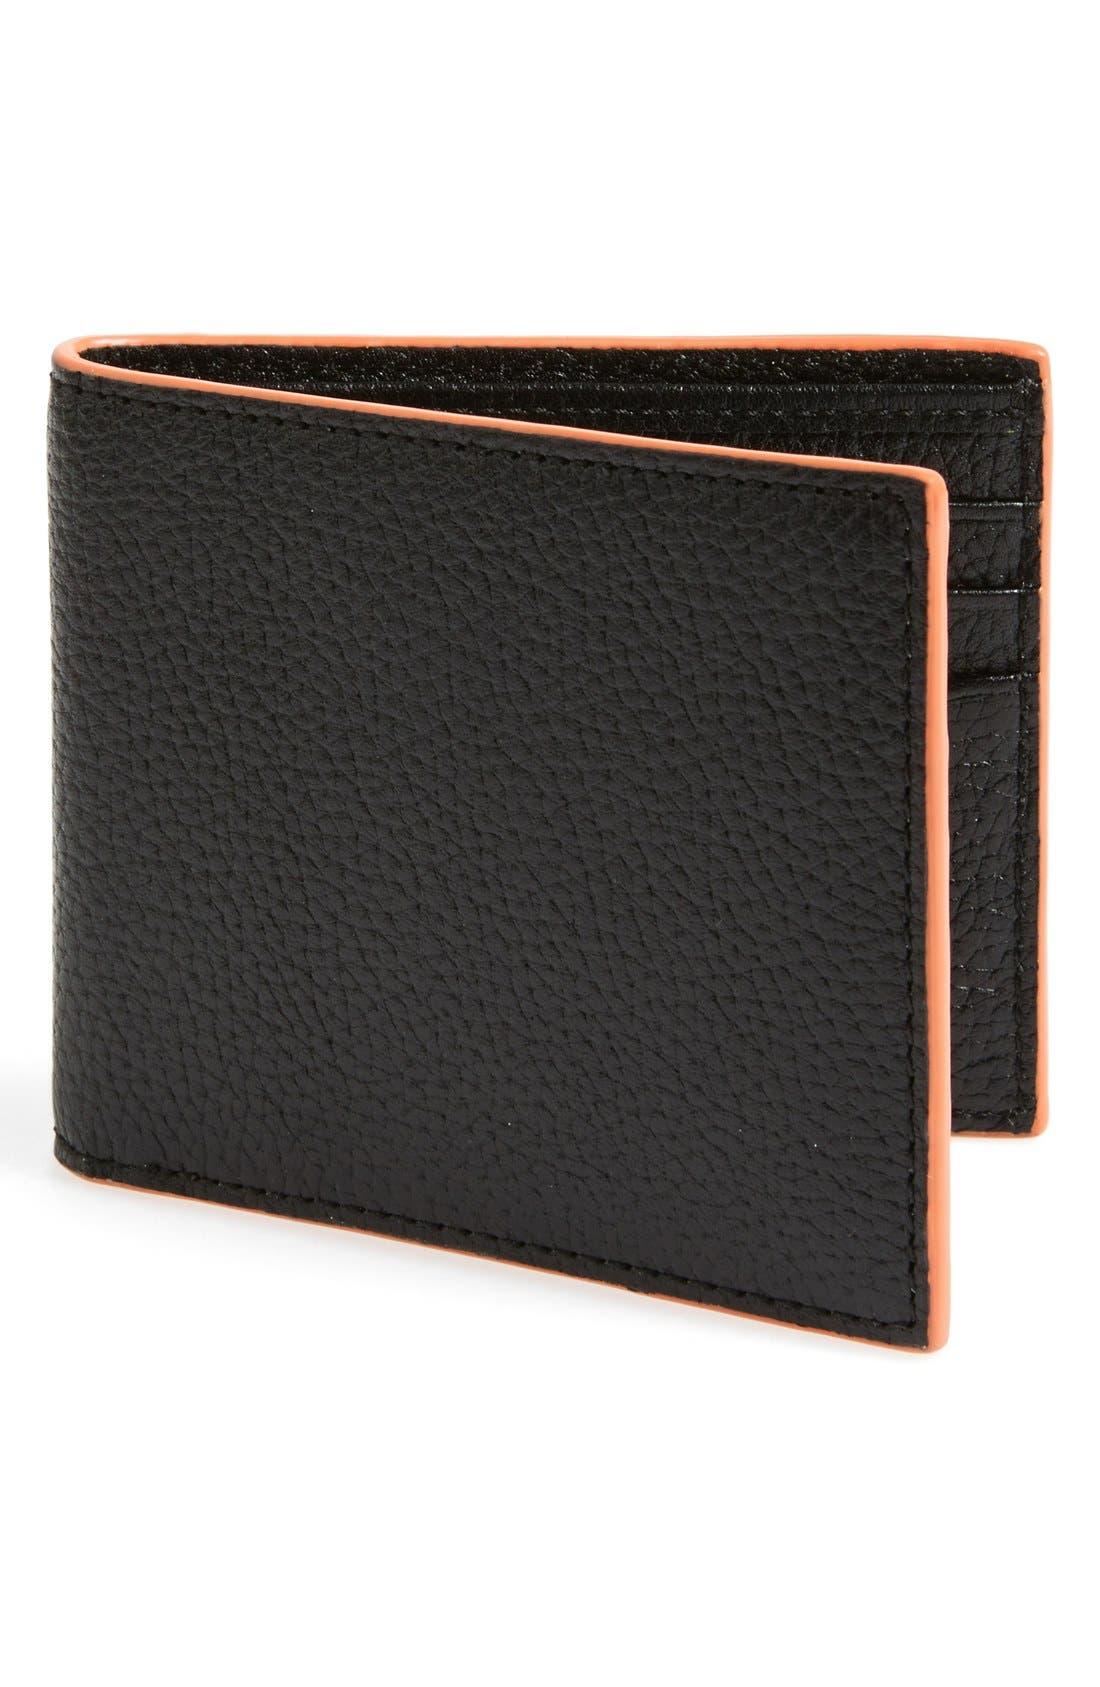 Main Image - Jack Spade 'Mason' Leather Wallet